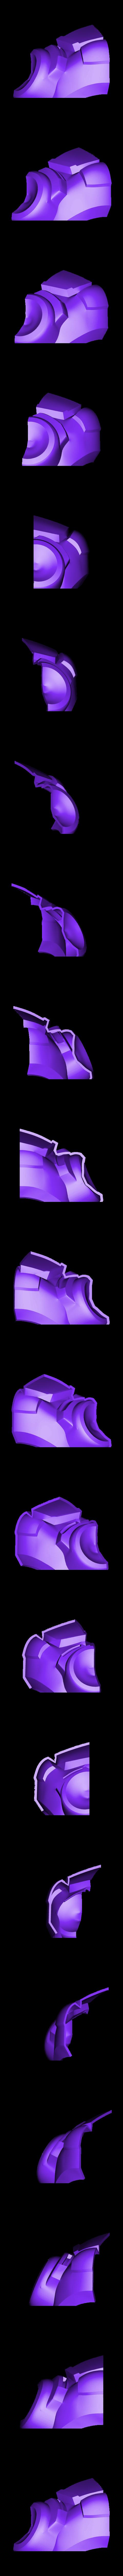 Part_4_v4.stl Download free STL file  Blood Dragon Helmet Mass Effect 2 (With Back Access) • 3D printable template, VillainousPropShop